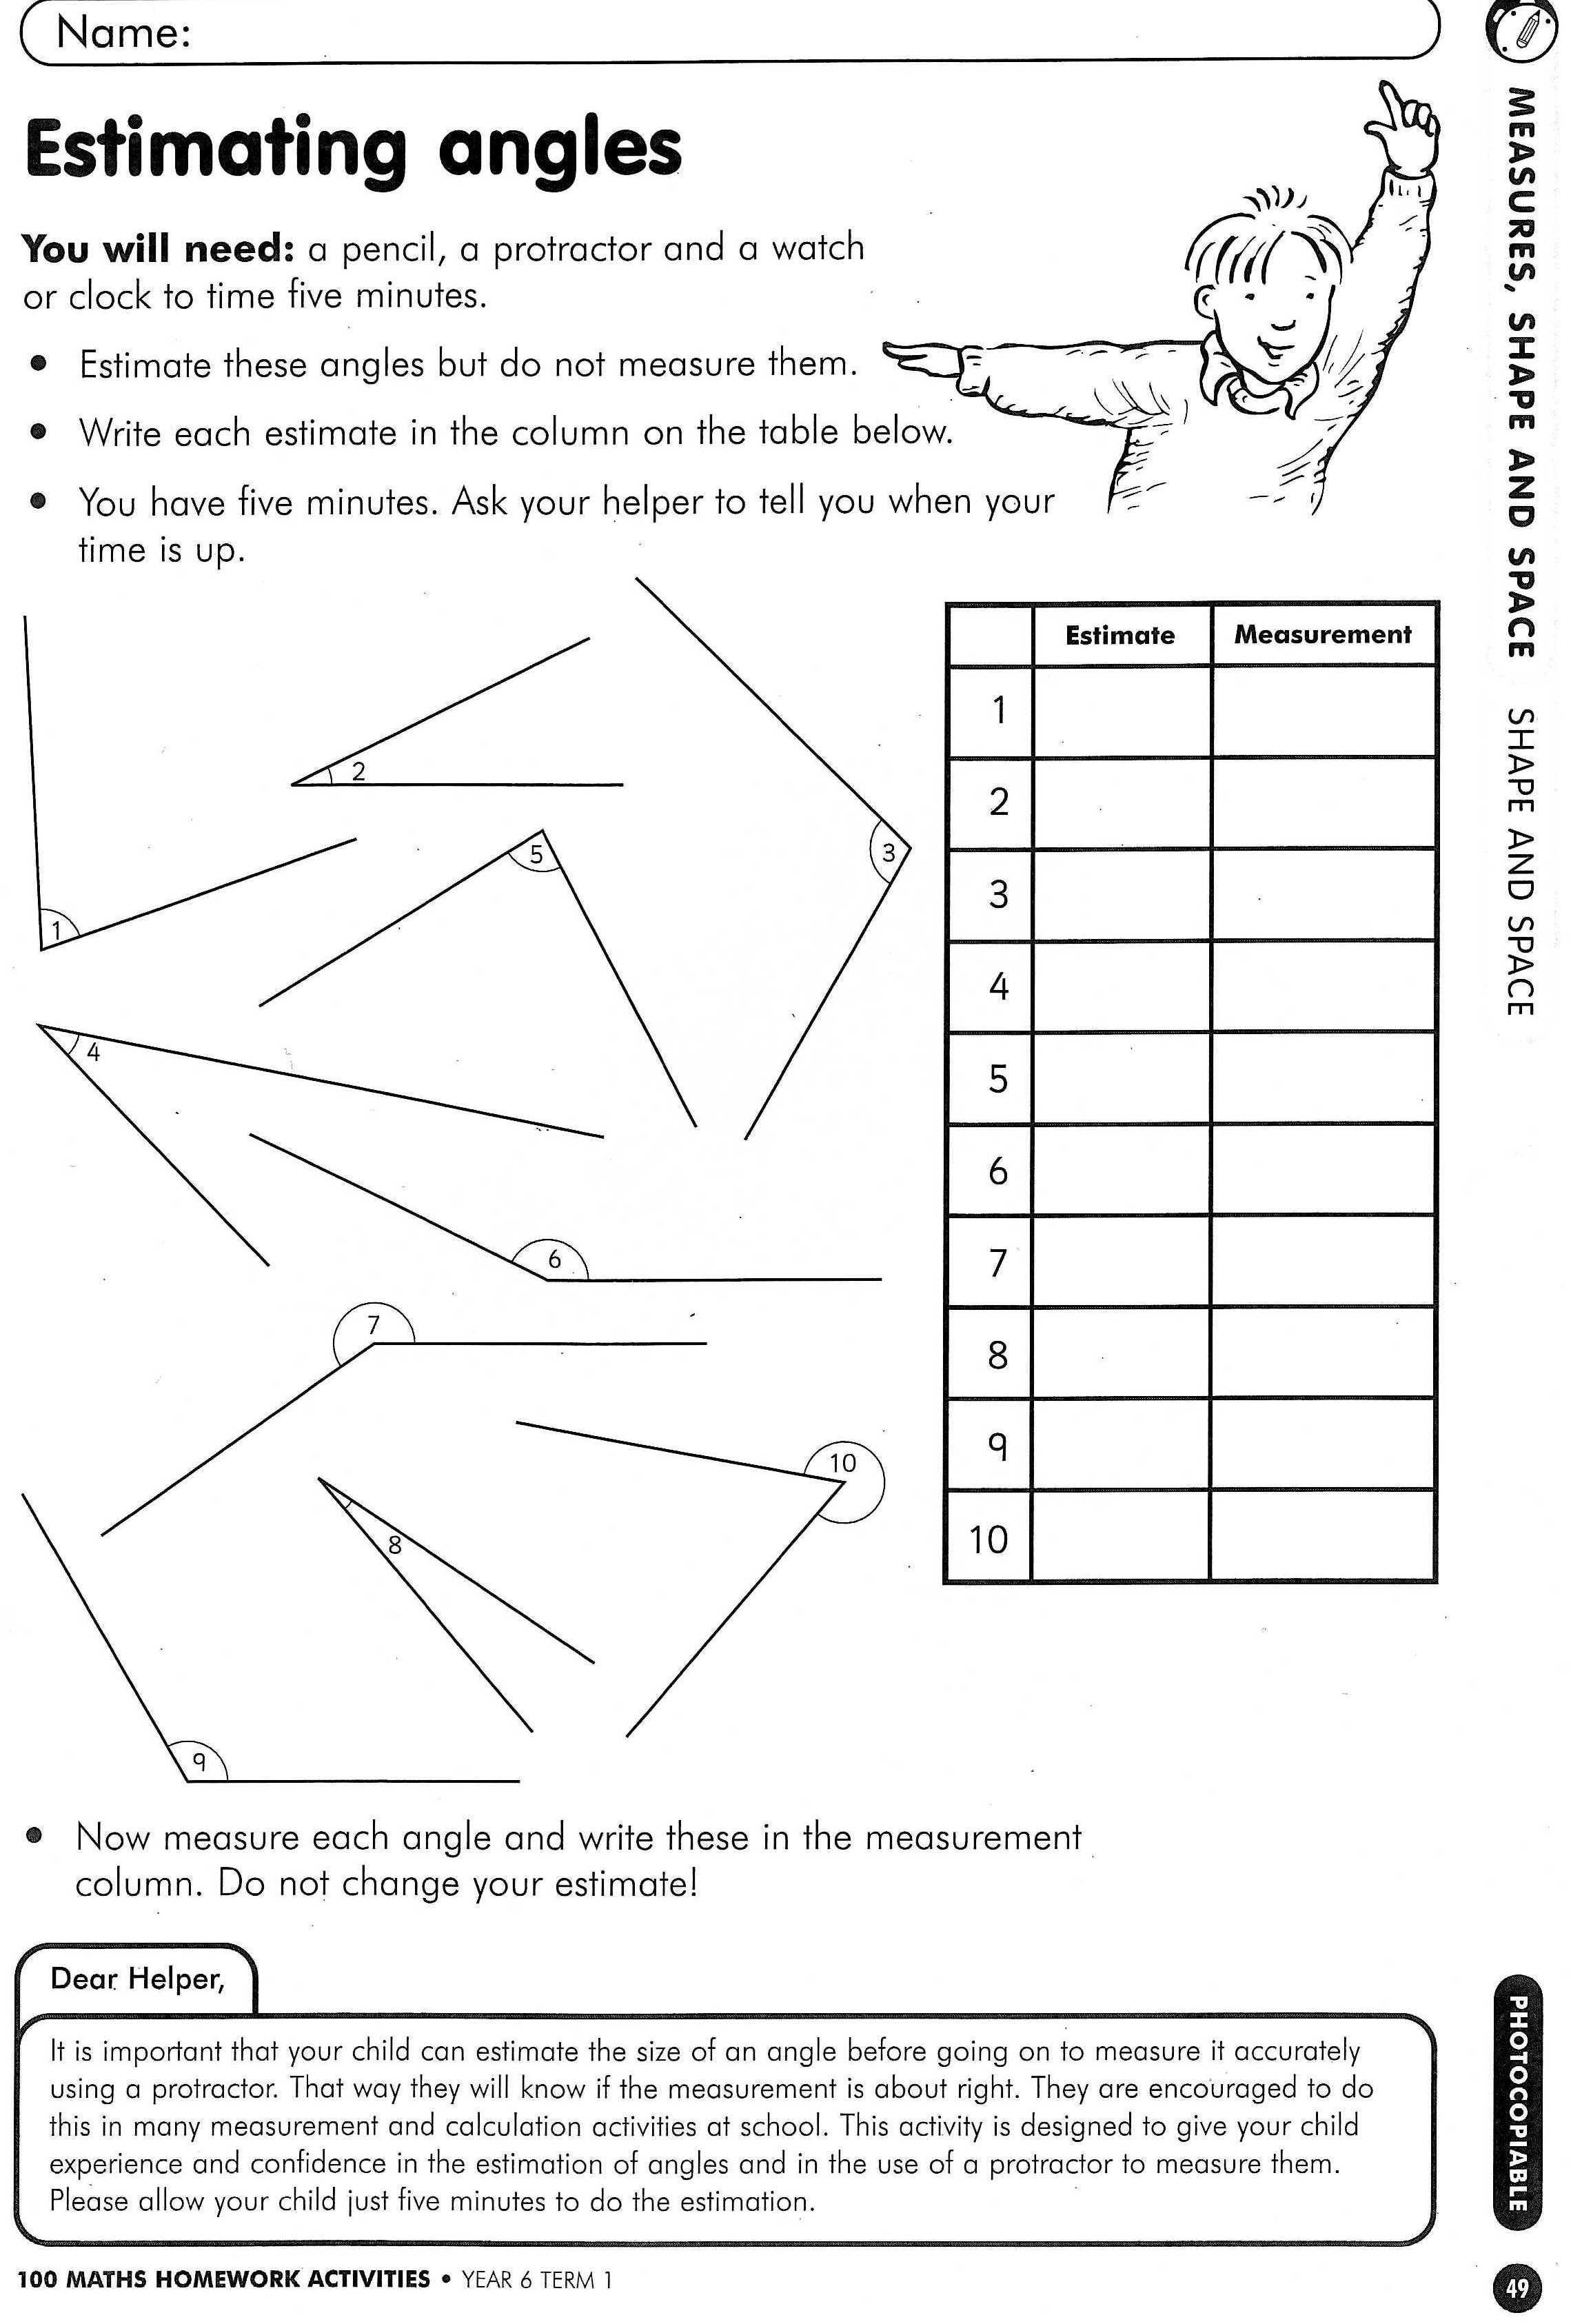 Snow Homework | St Michaels School